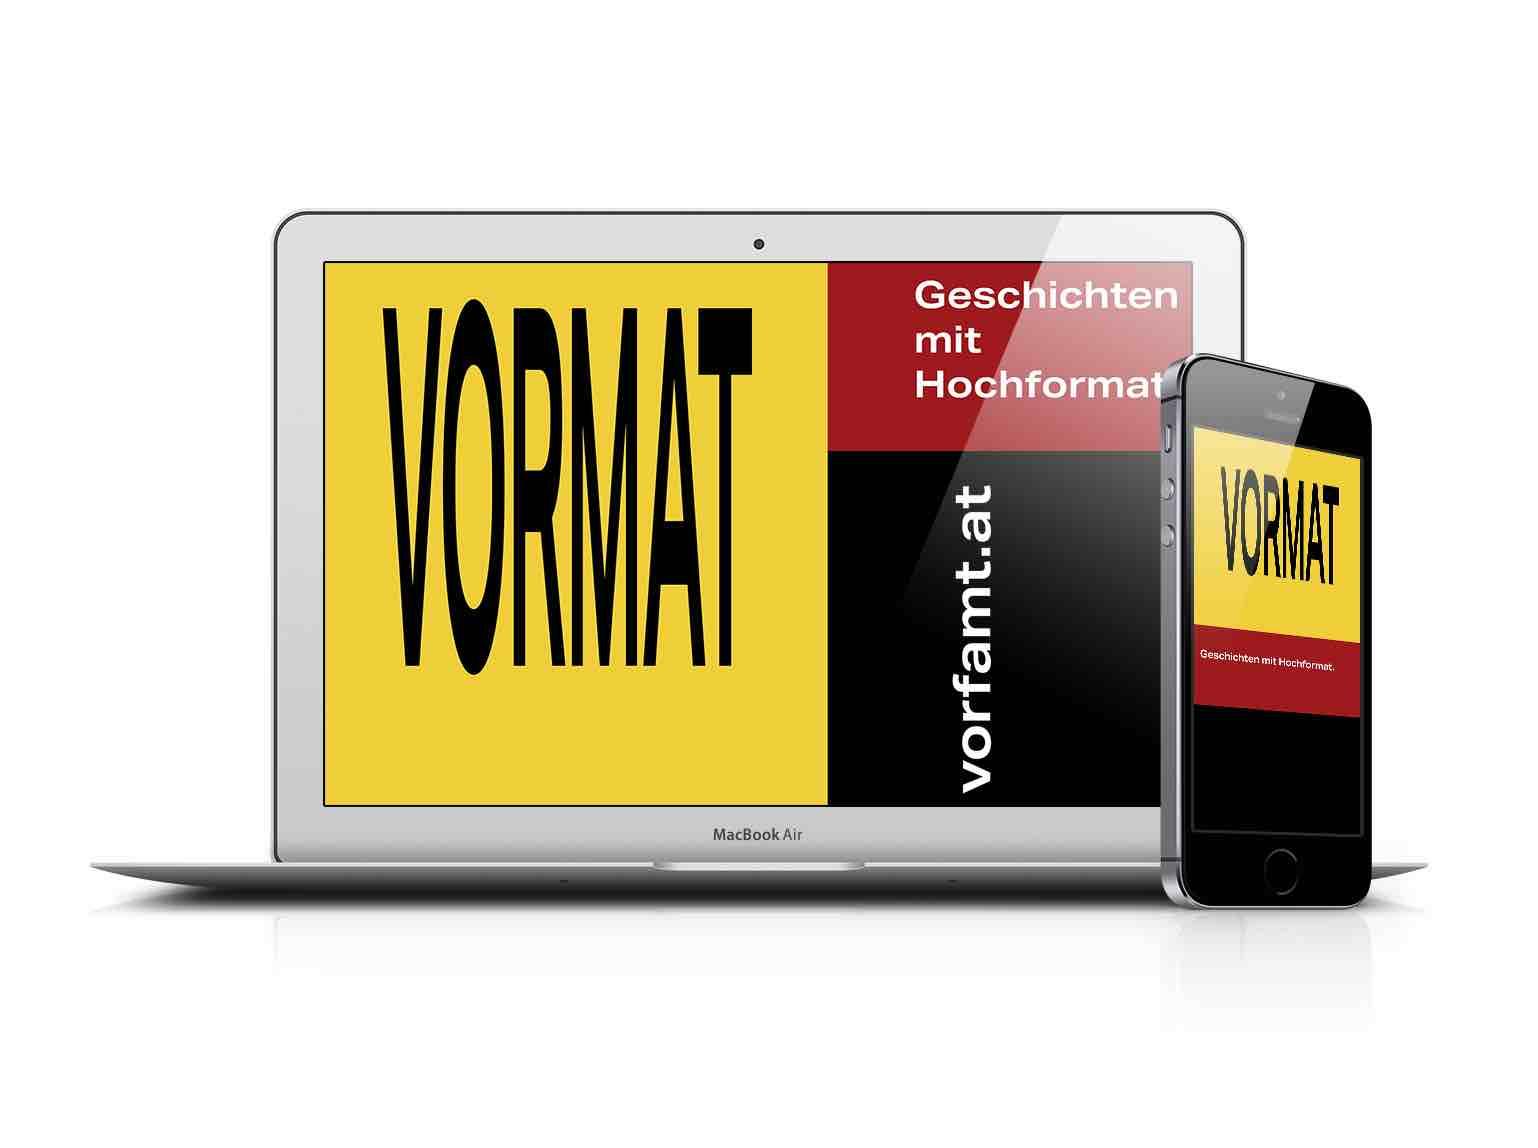 20190115_Vormat_Mockup_App